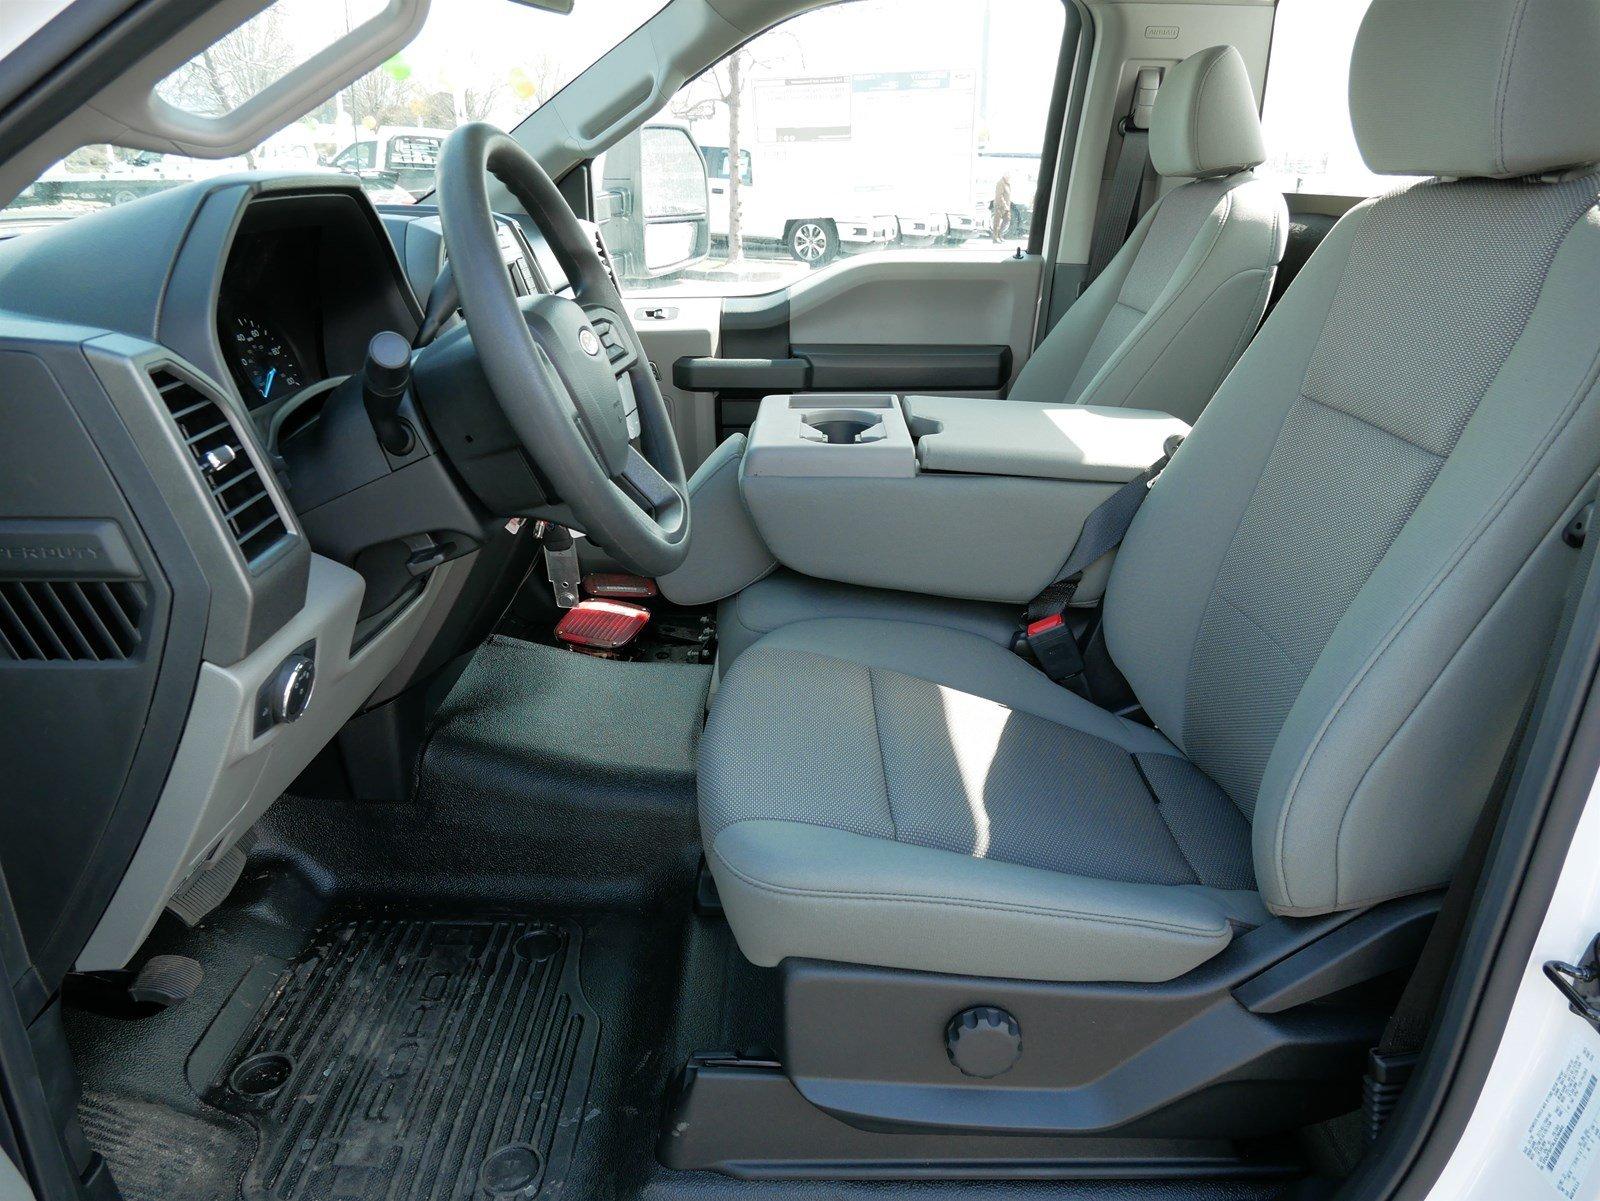 2020 F-550 Regular Cab DRW 4x4, Scelzi SEC Combo Body #63081 - photo 15